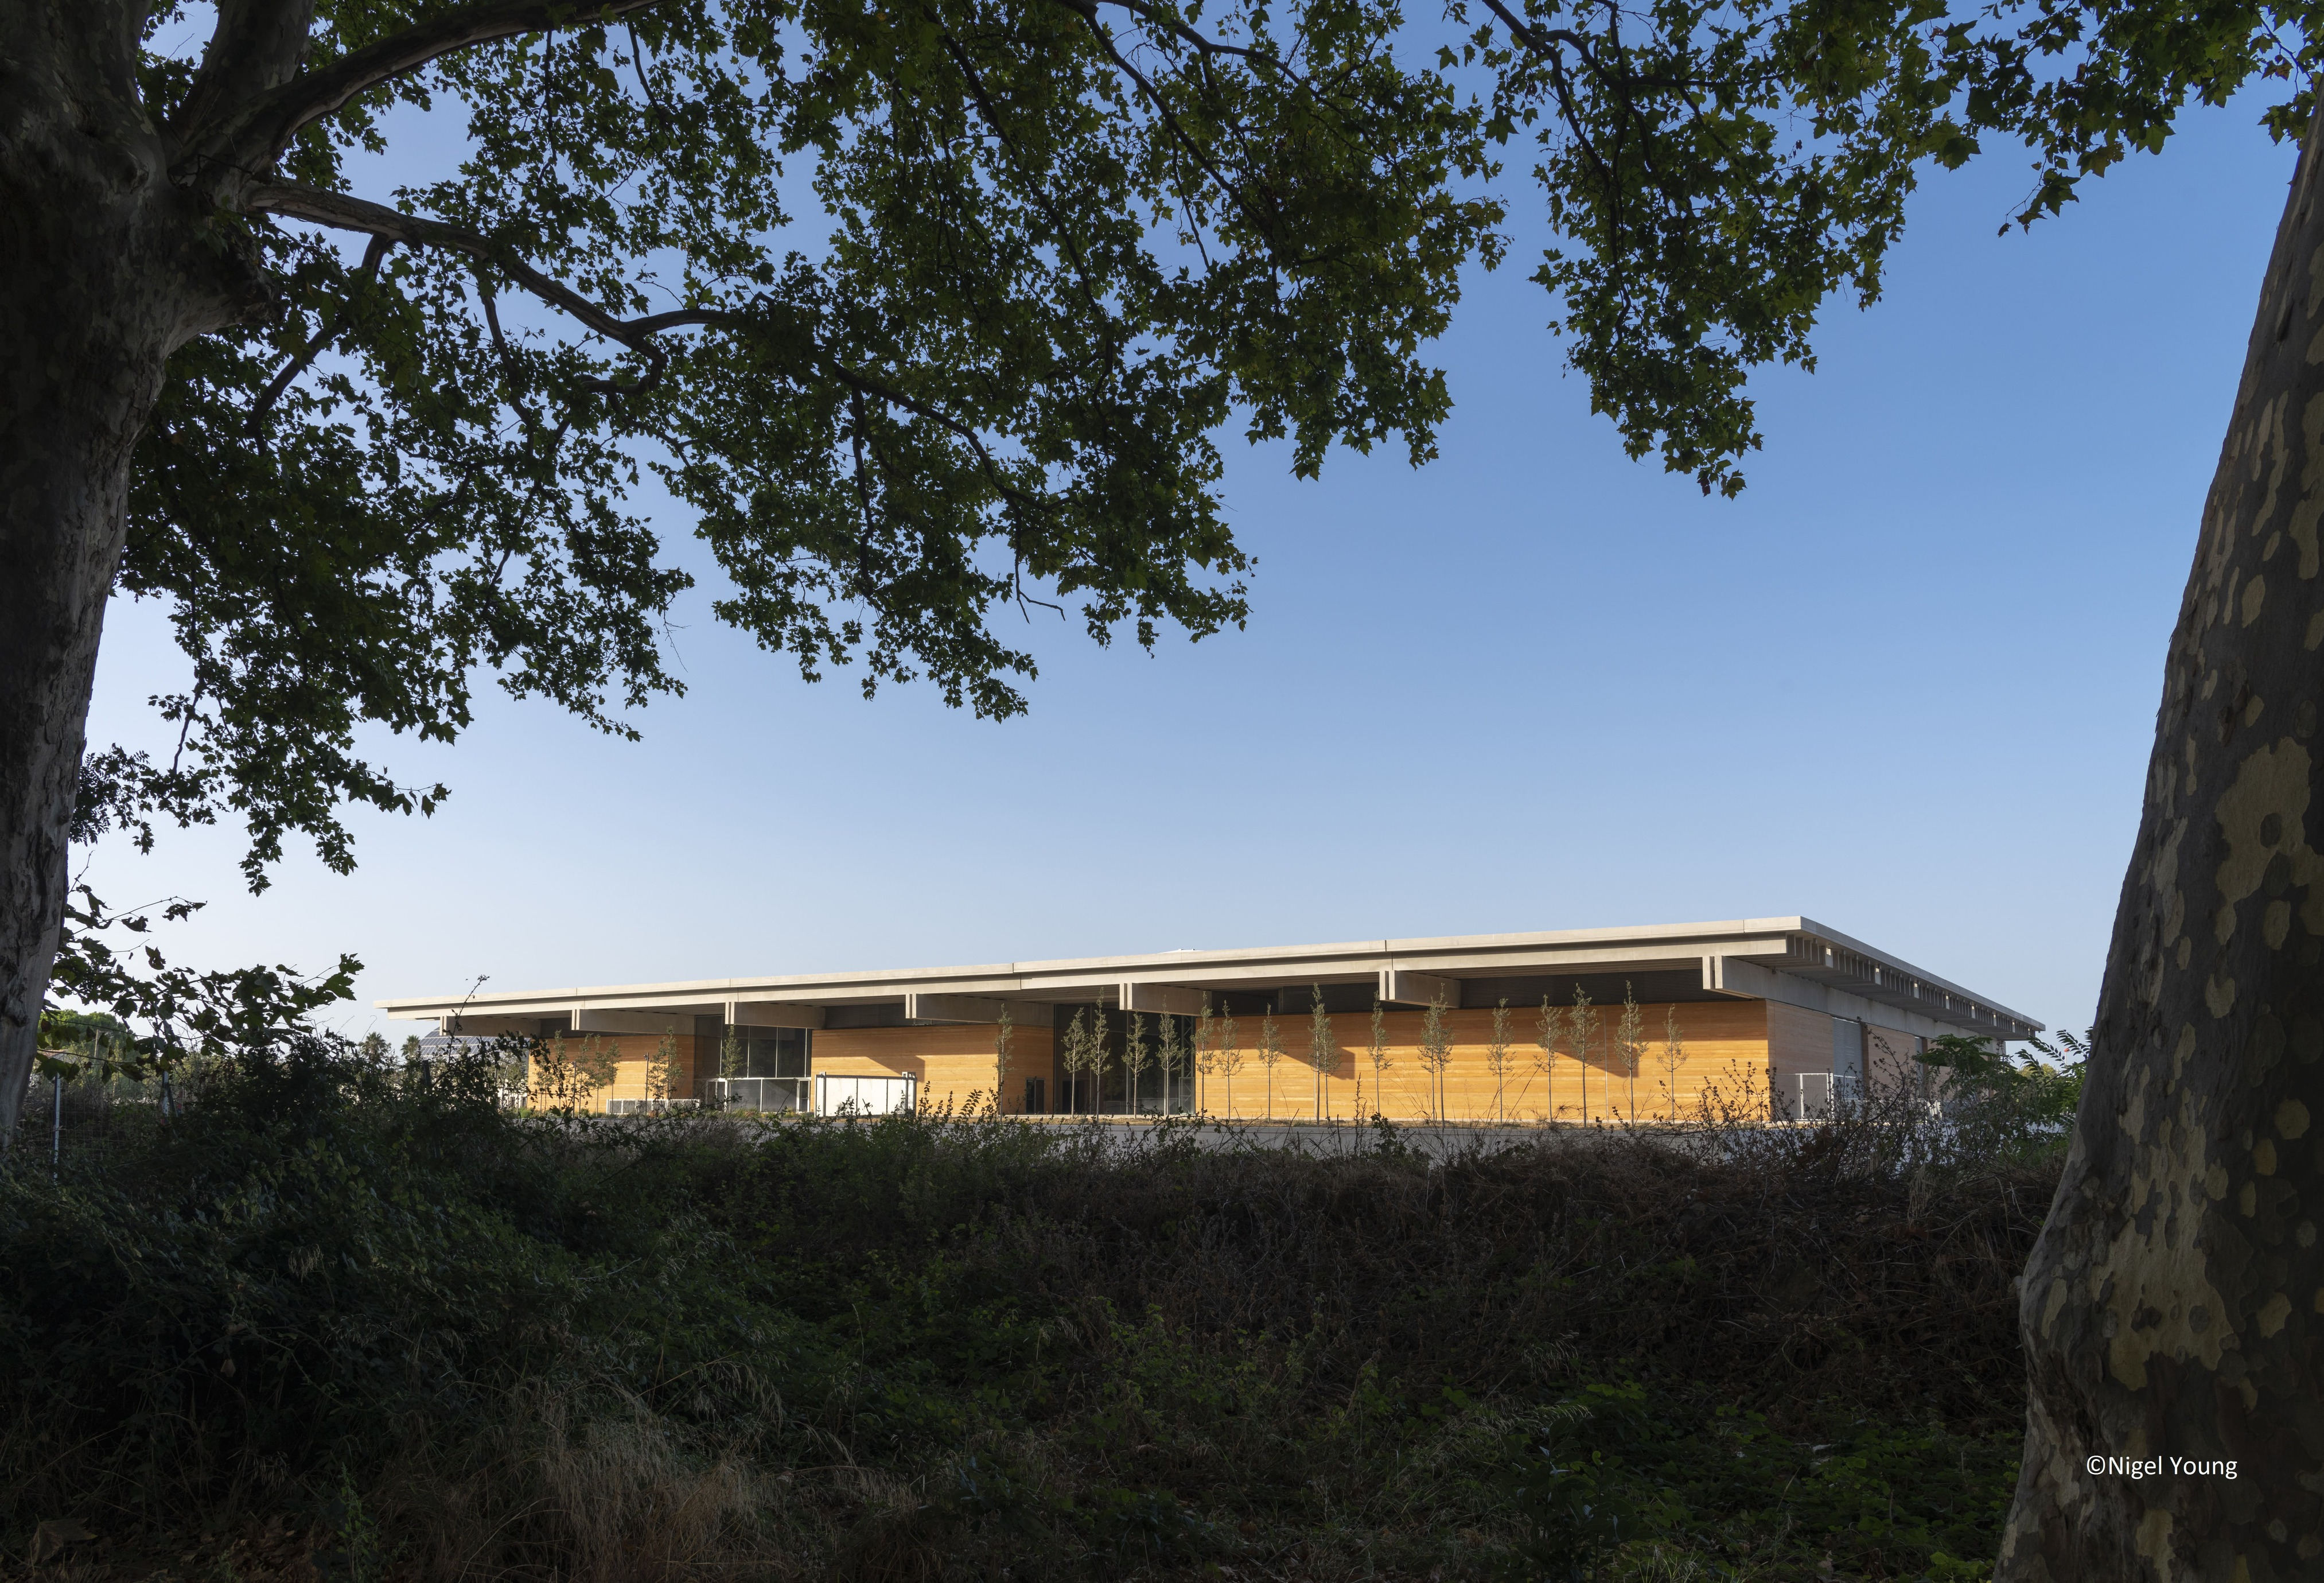 Musée NarboVia - Photo par Nigel Young